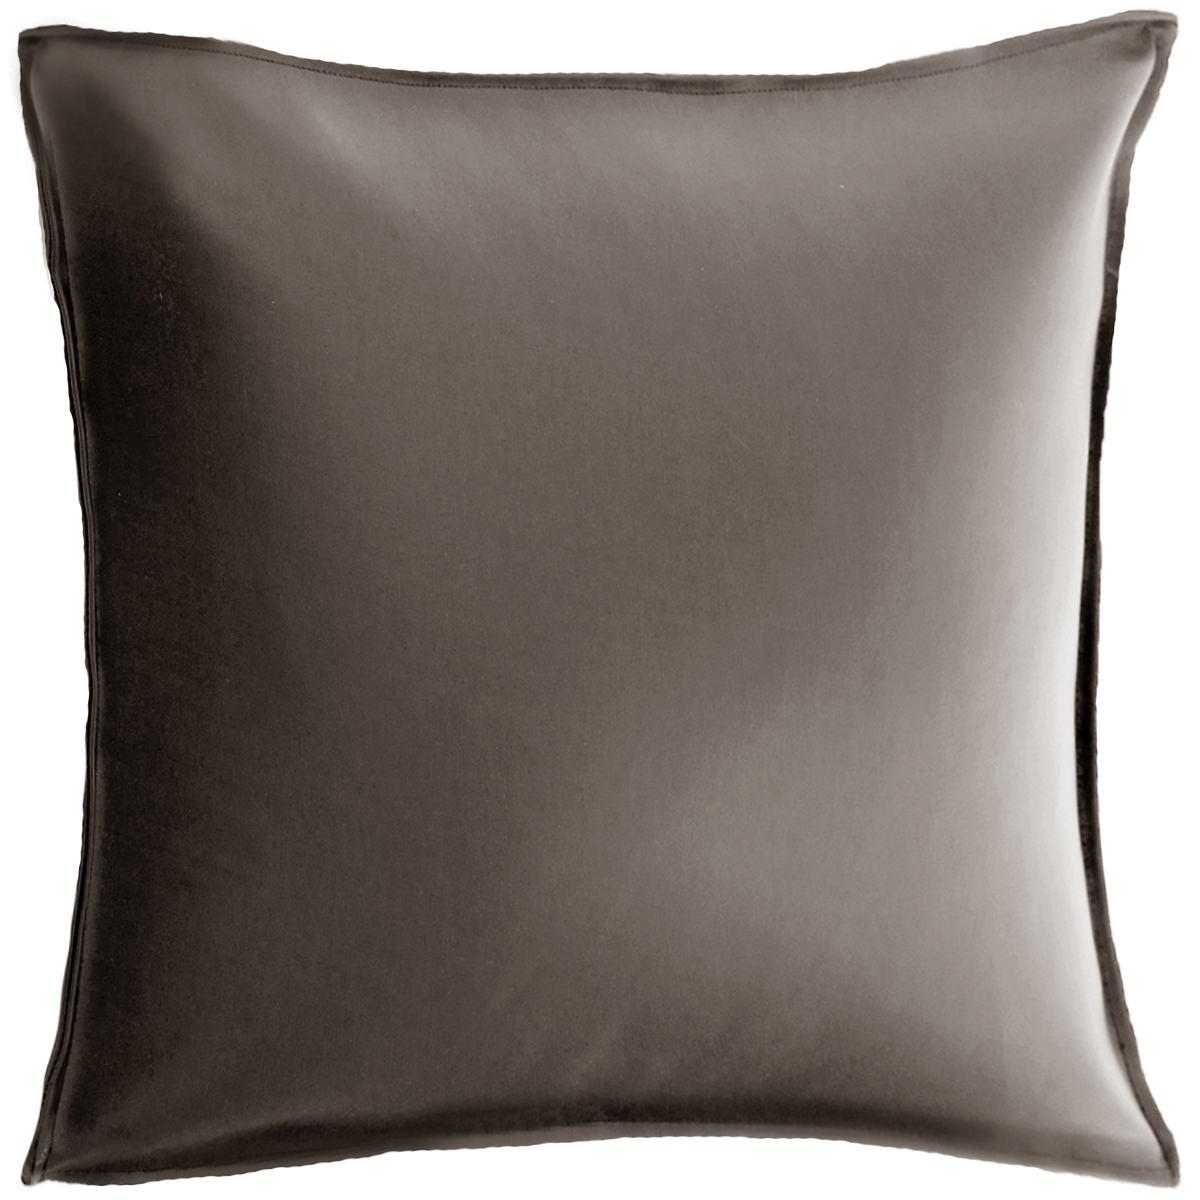 Preservation Cocoa Decorative Pillow